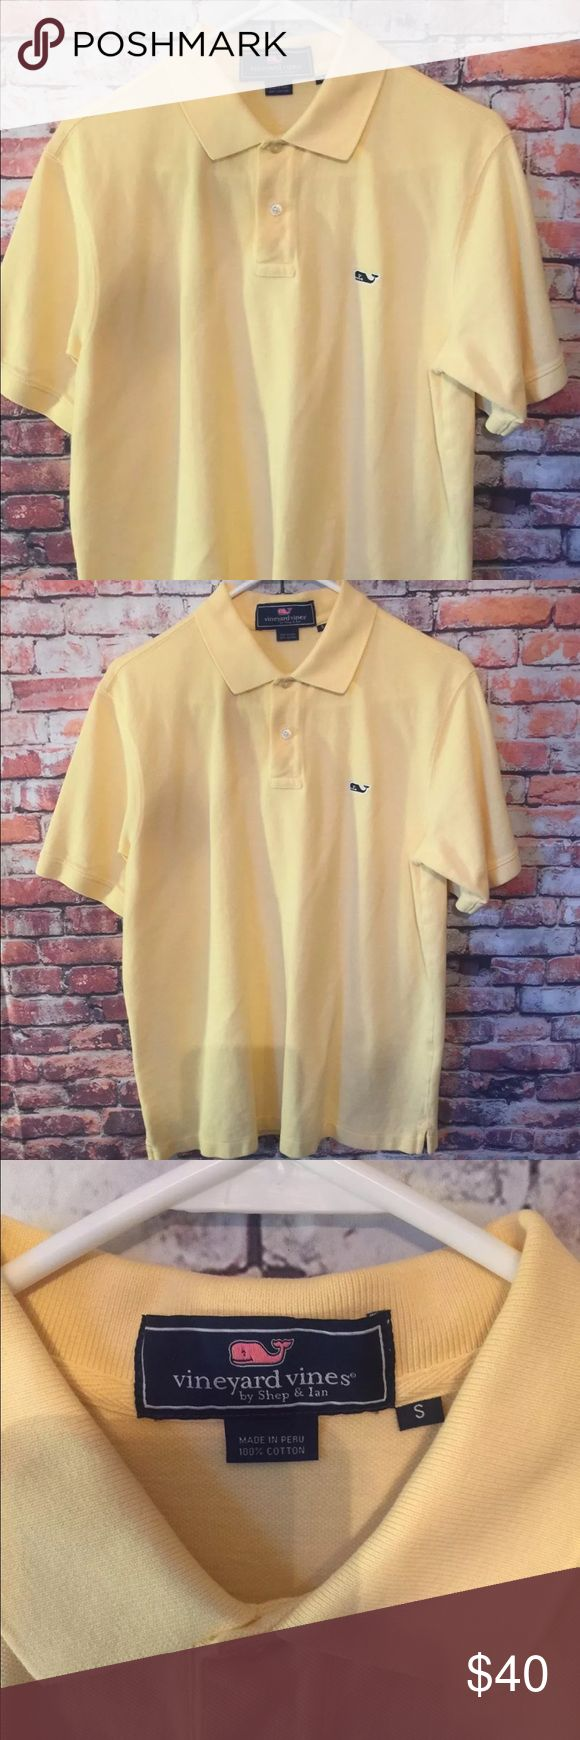 "Vineyard Vines Mens Classic Polo Lemonade Yellow S Type: Men's Polo Shirt Brand: Vineyard Vines Material: 100%Cotton Color: Lemonade Yellow Measurements: Armpit-Armpit 19 1/2"" Chest 15"" Length 26 1/2"" Condition: ""Like New""/Great Condition@ Stock Number#92 Vineyard Vines Shirts Polos"